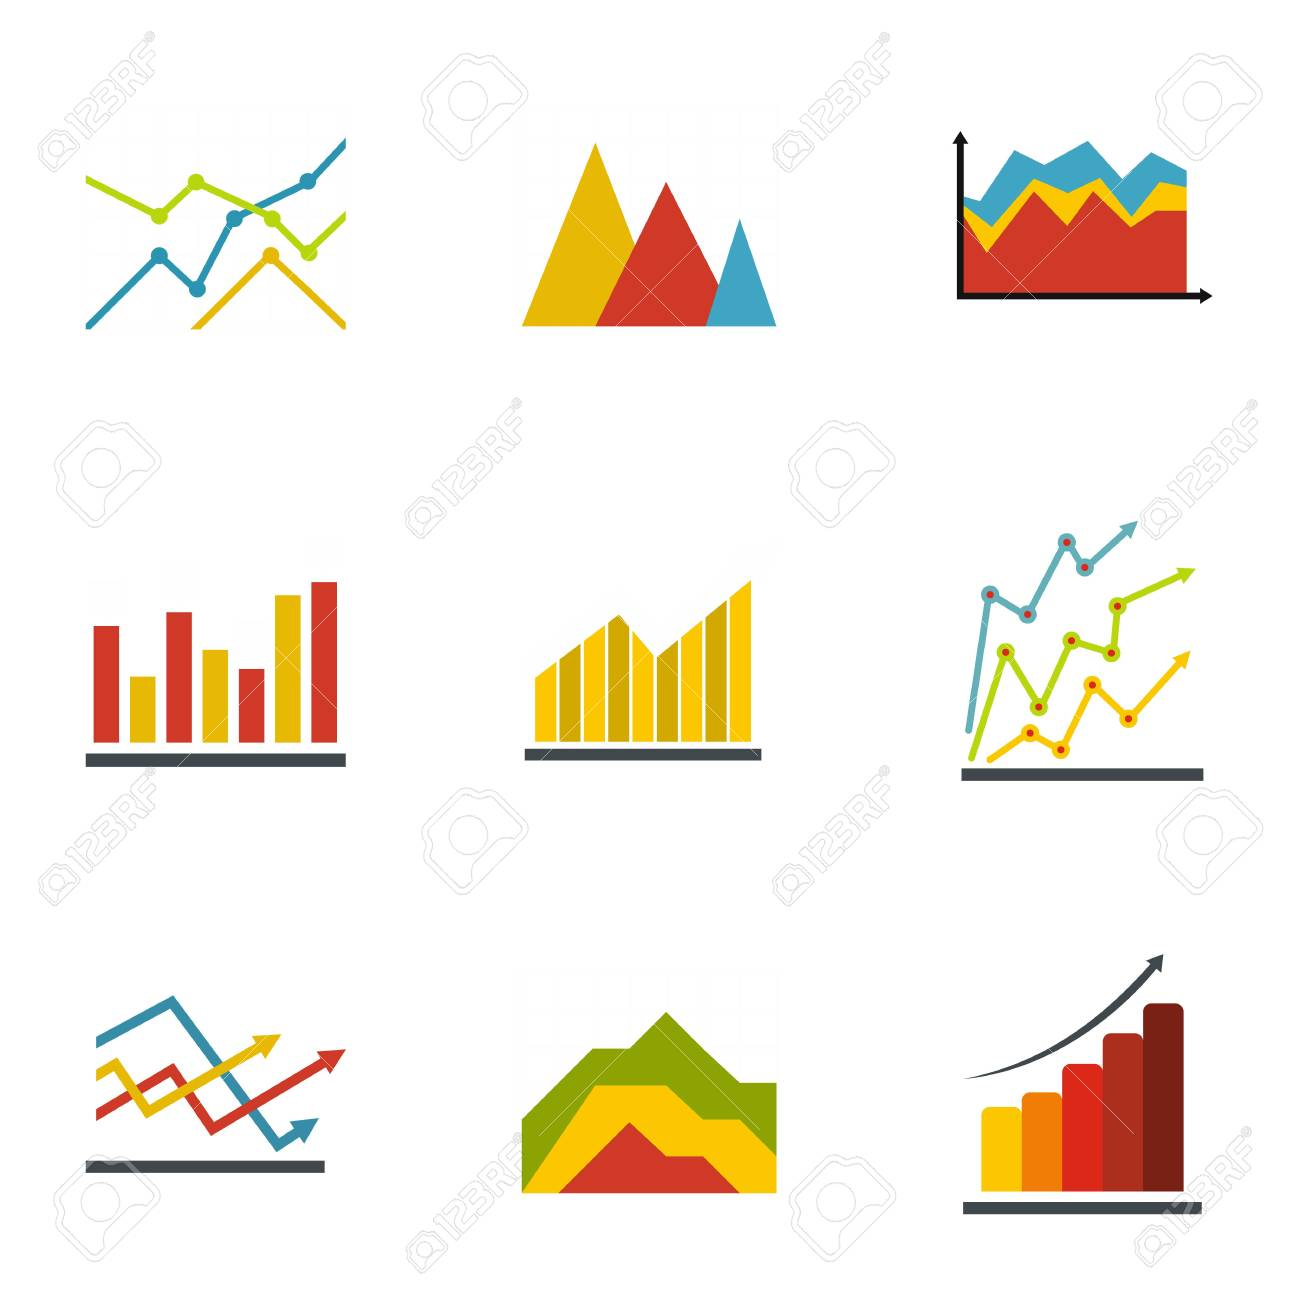 graph icons set flat